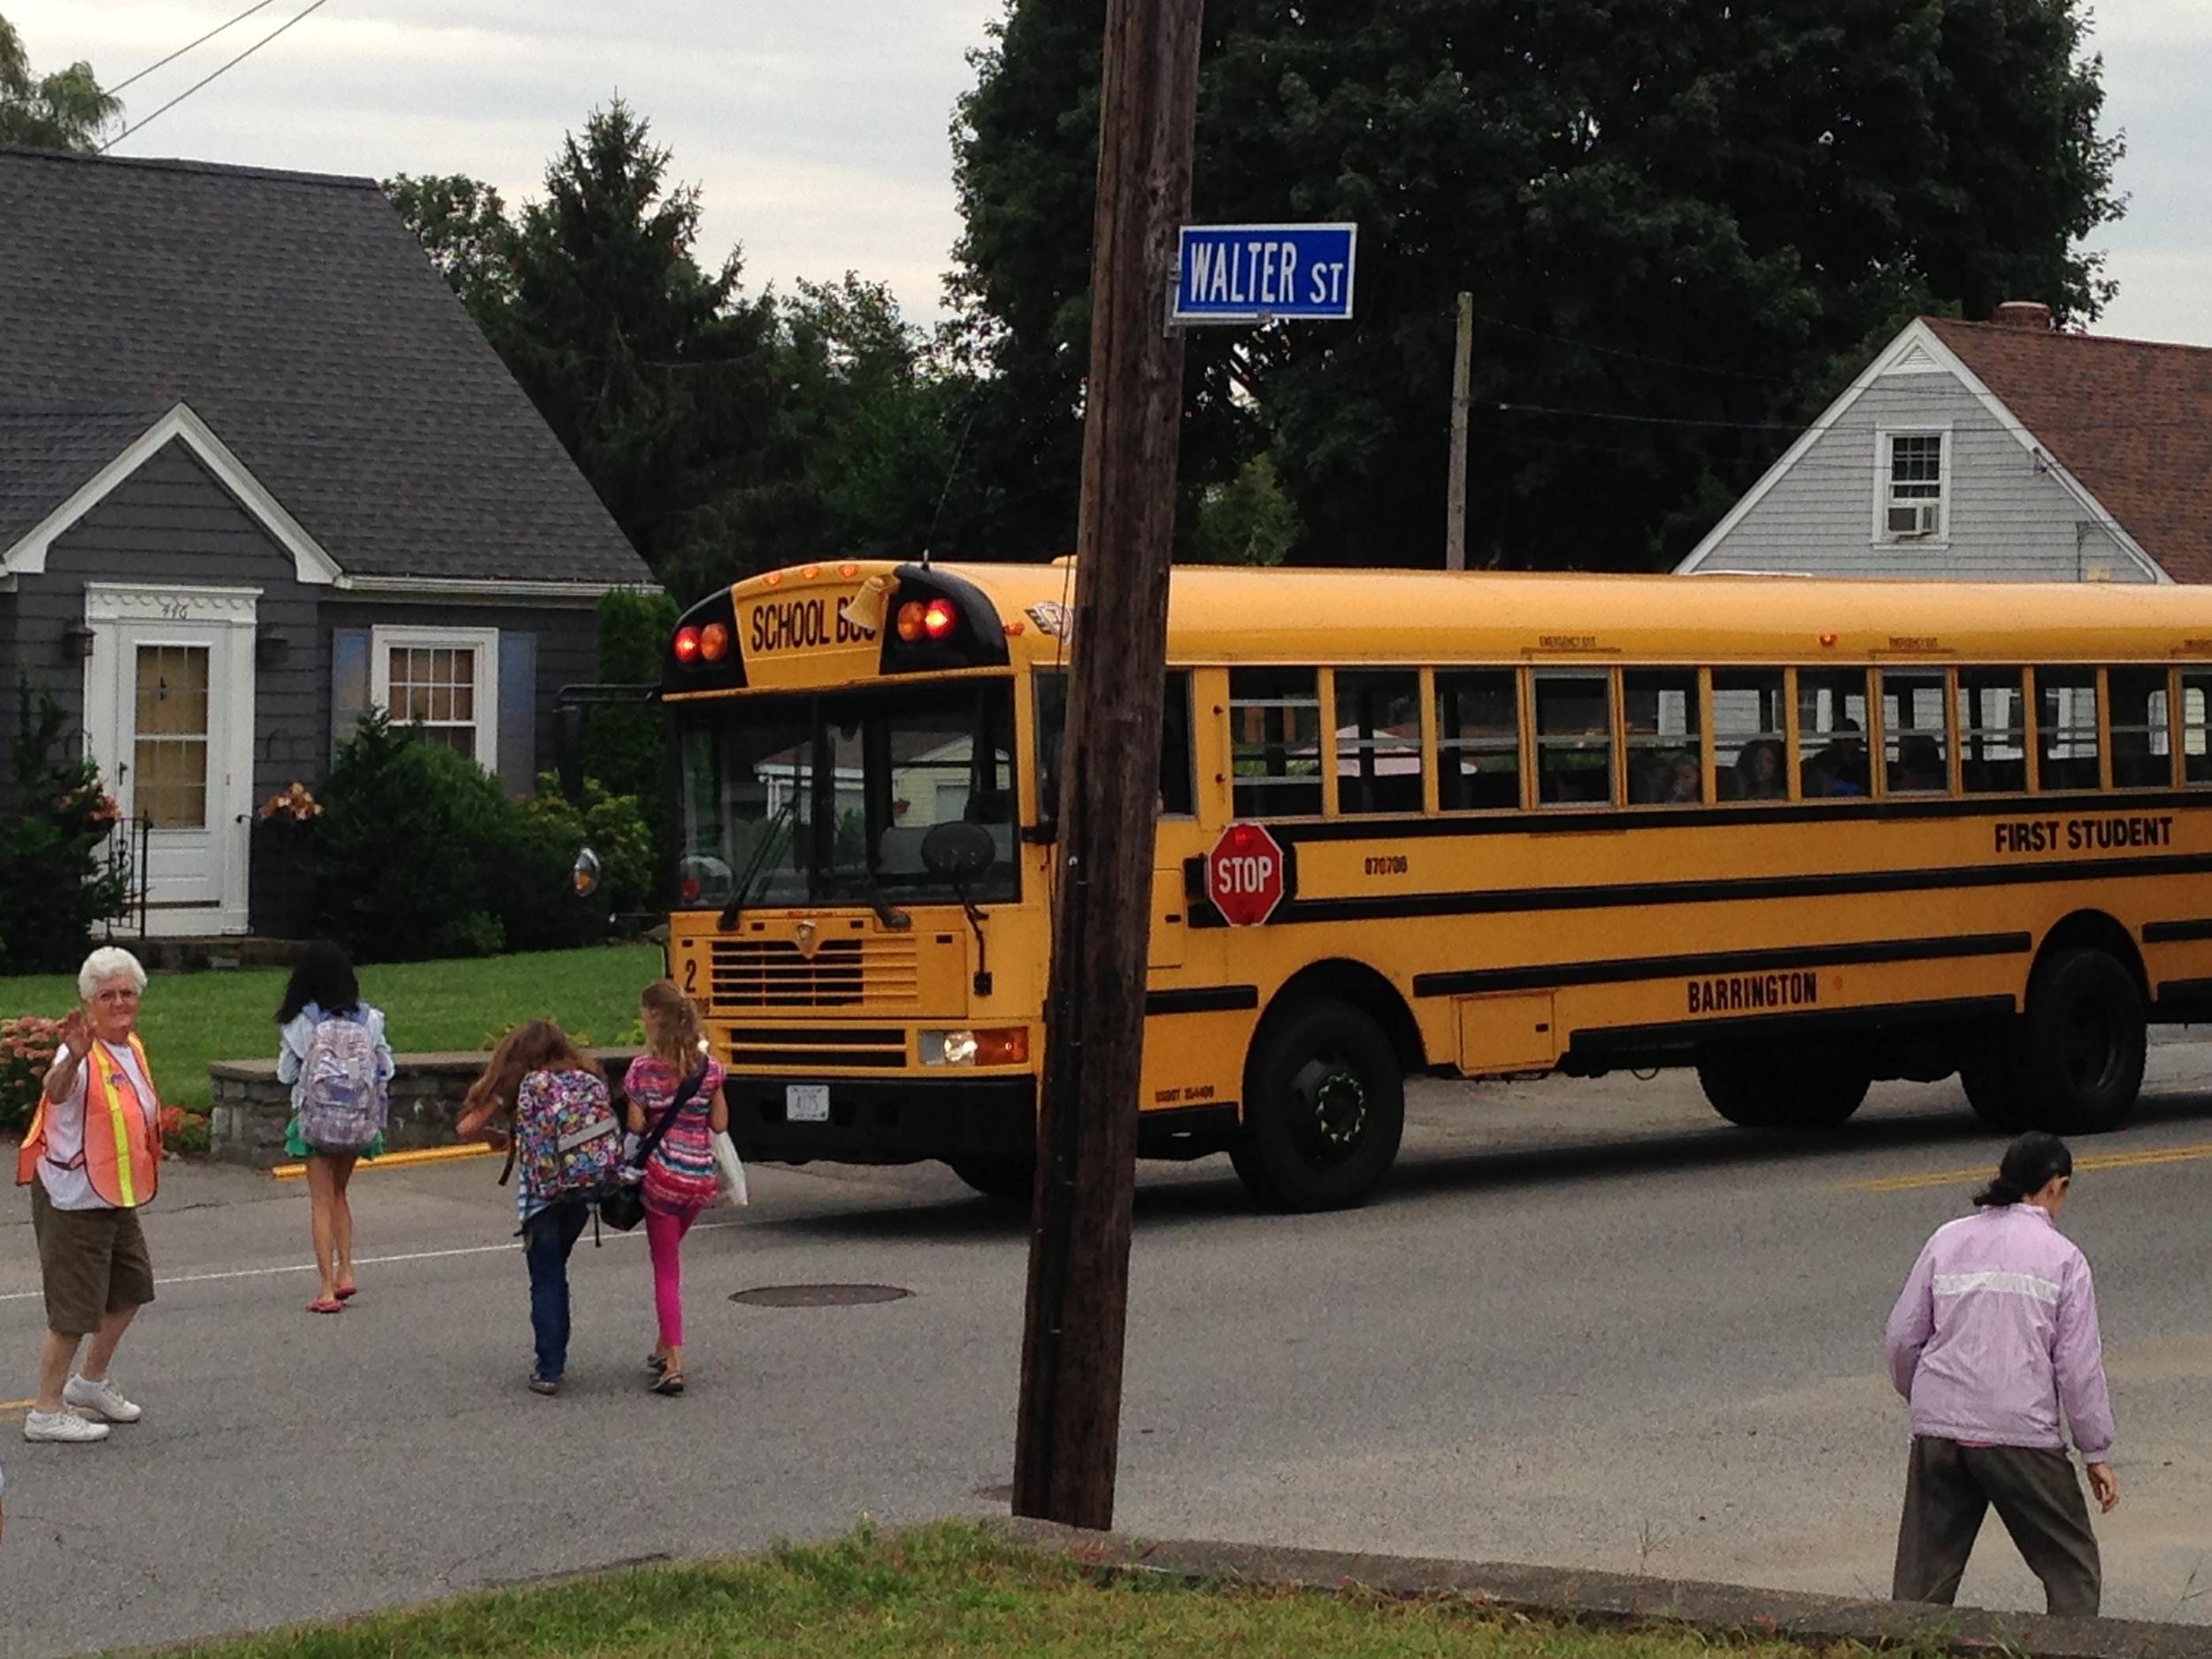 Klara going into the school bus